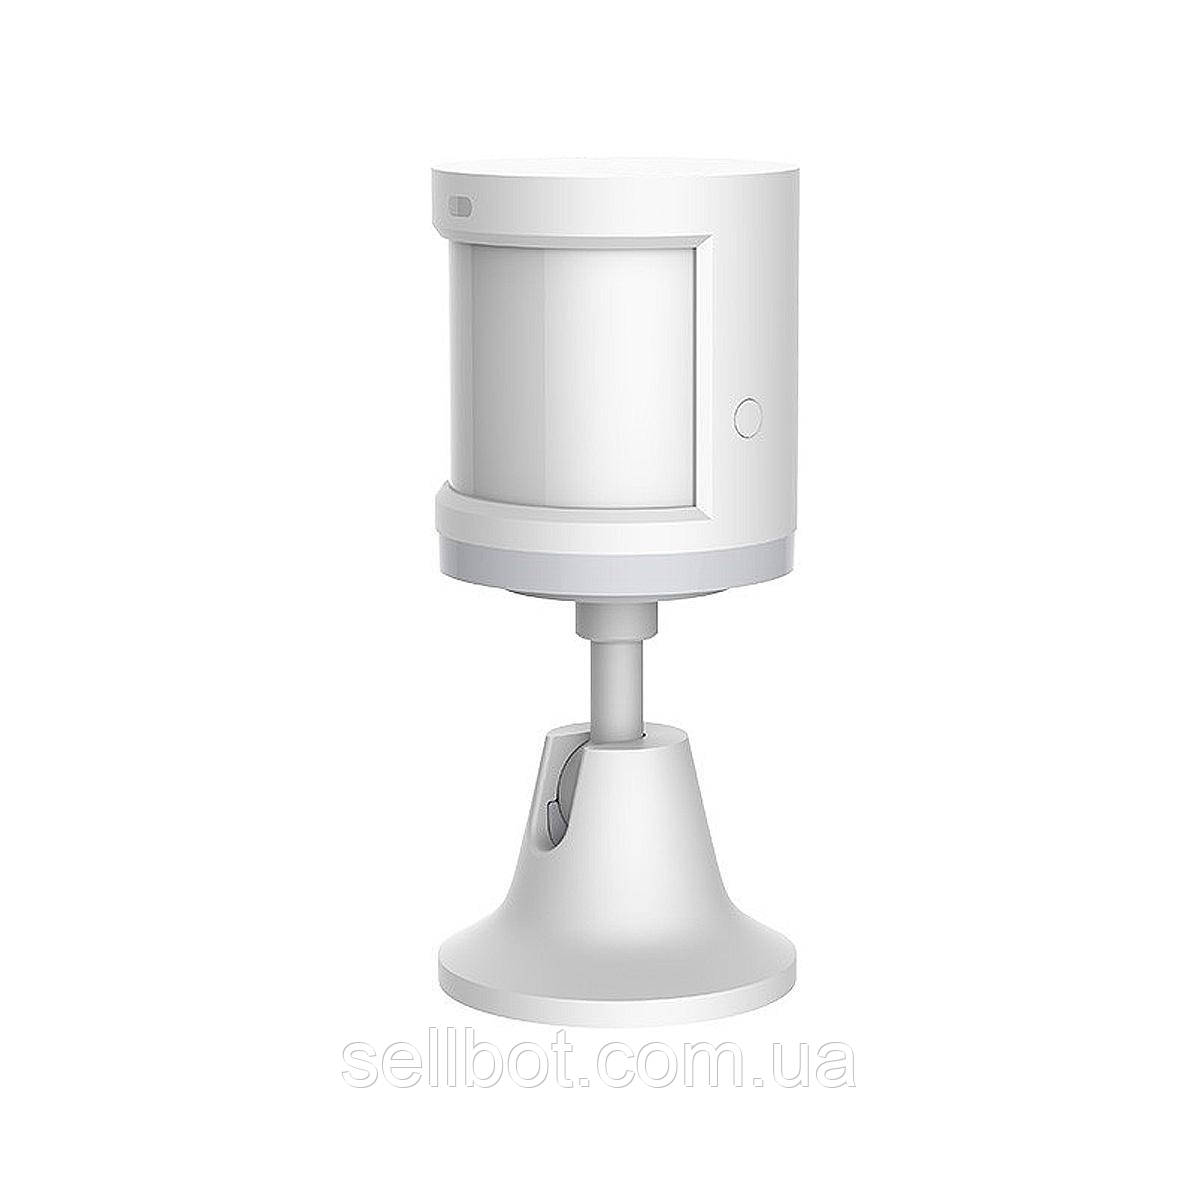 Датчик руху Xiaomi Aqara Human Body Sensor Smart HomeKit Wireless ZigBee (датчик движения)